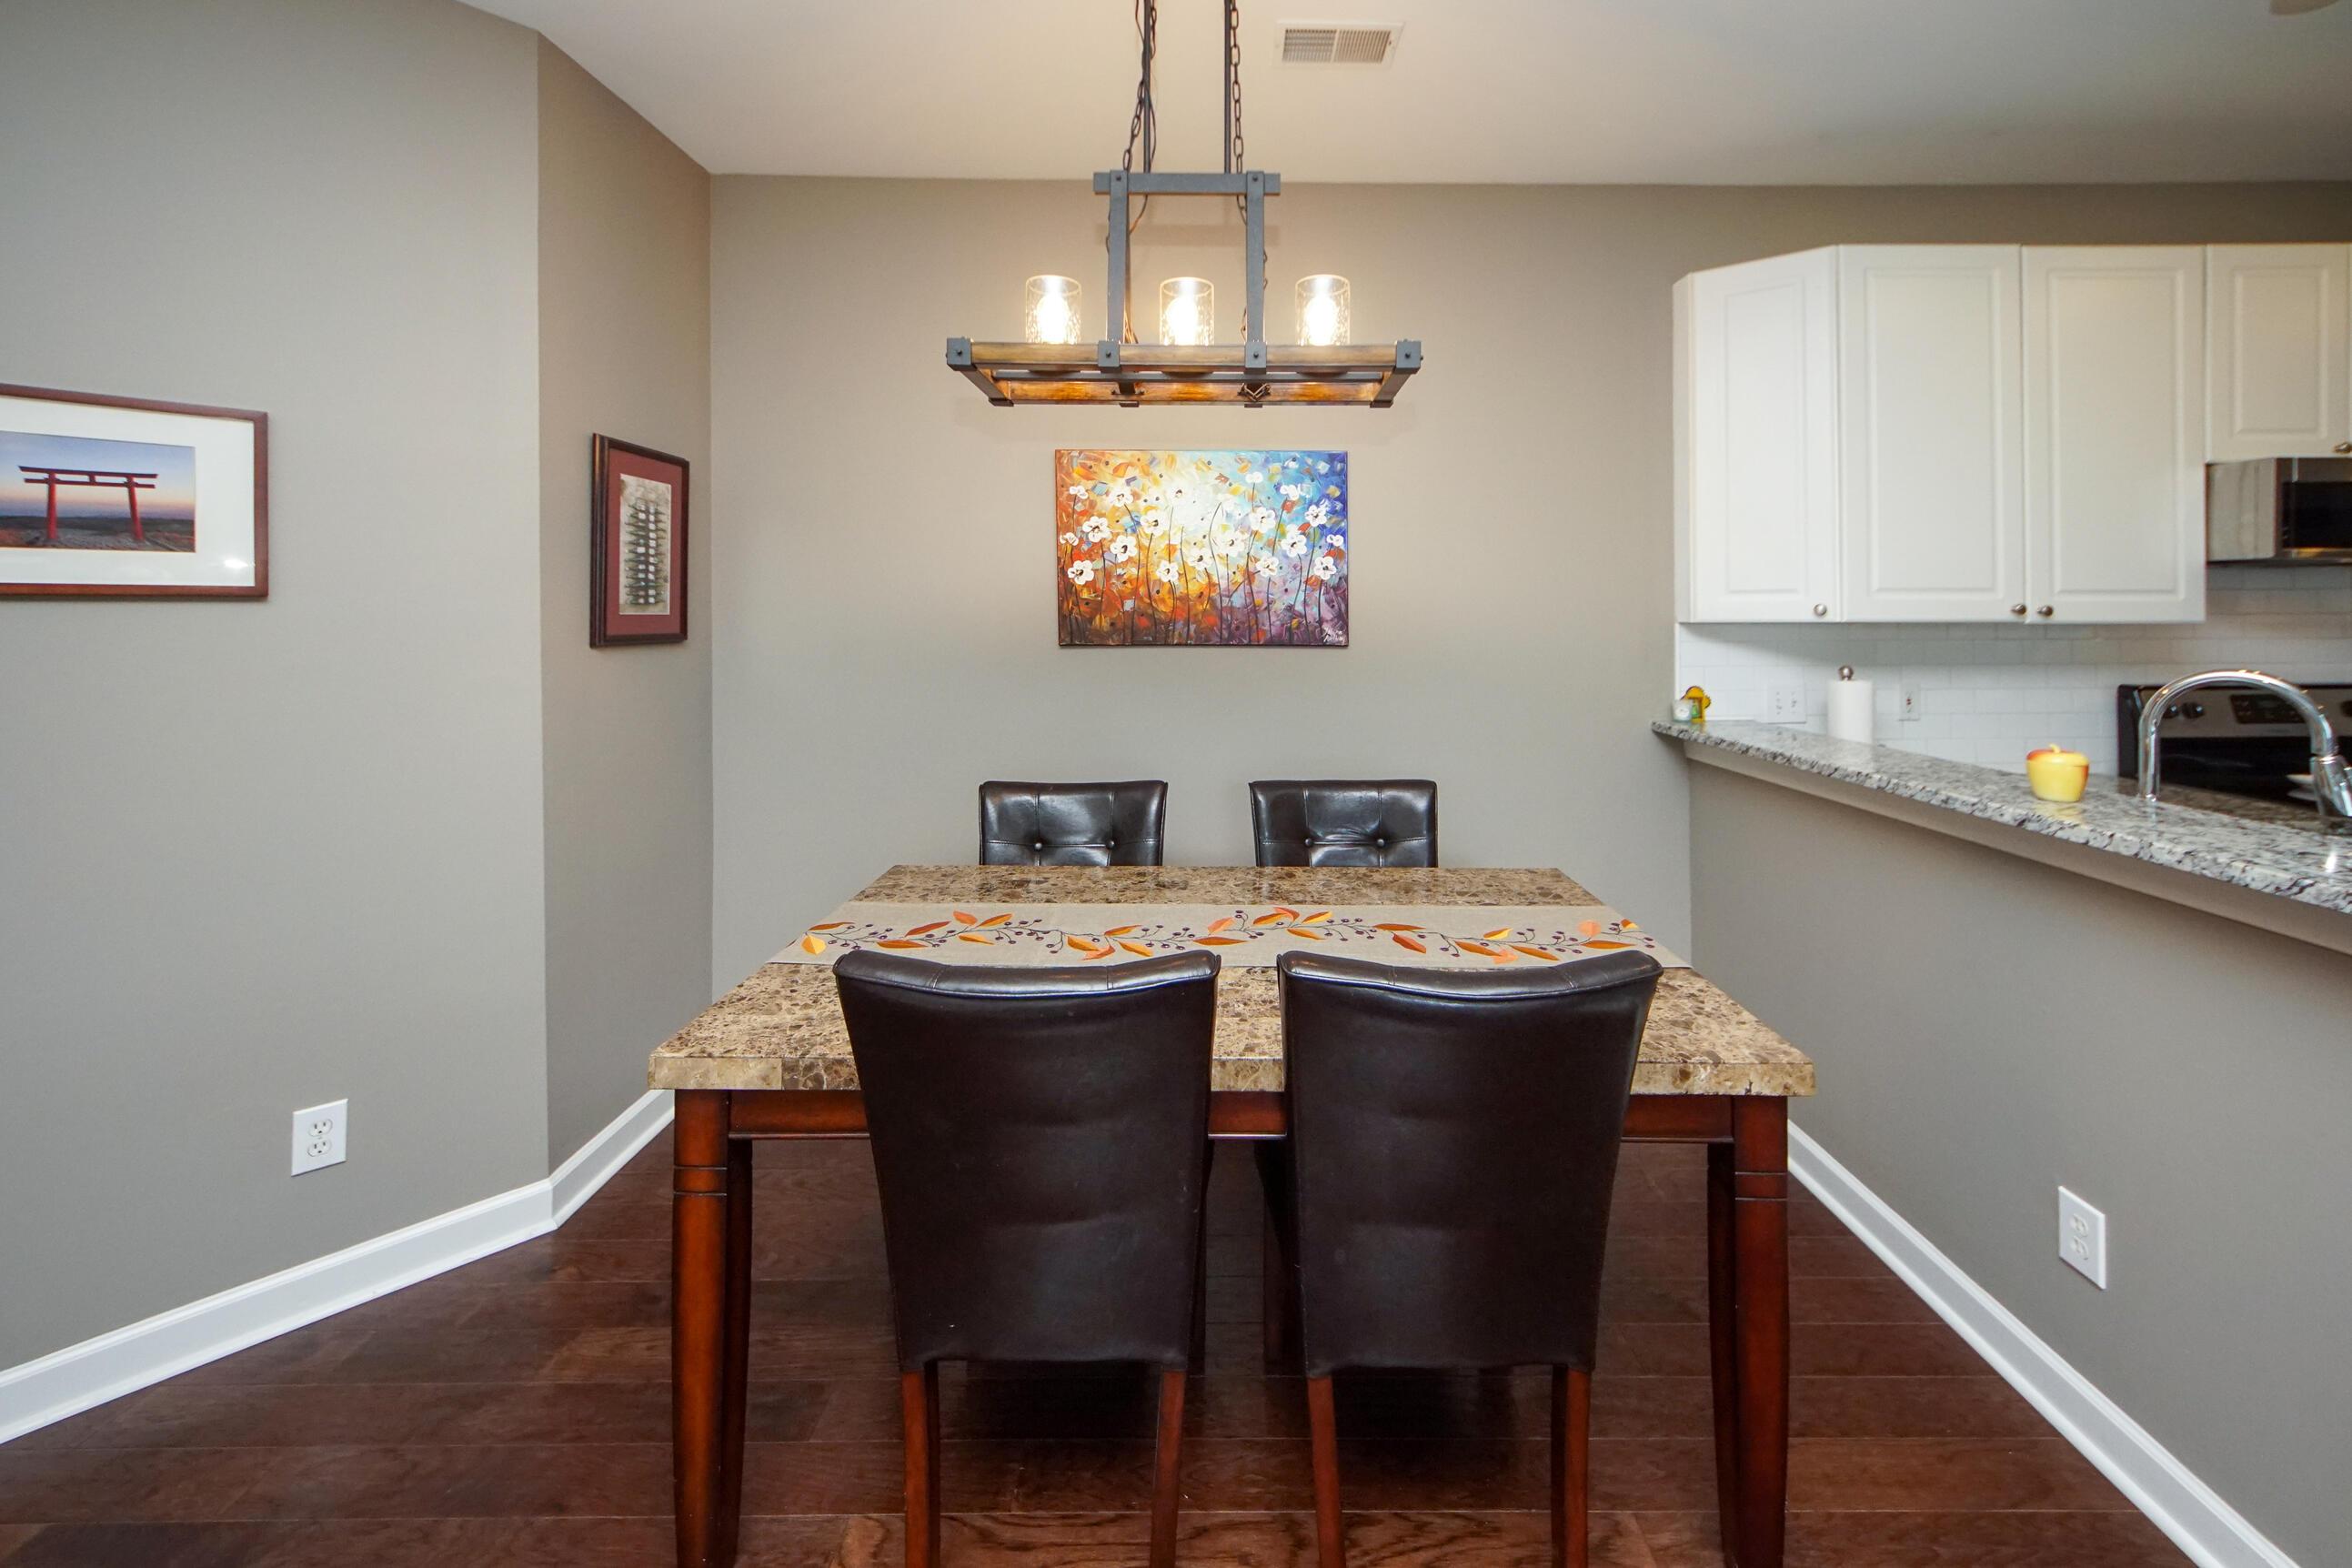 Dunes West Homes For Sale - 1631 Camfield, Mount Pleasant, SC - 1